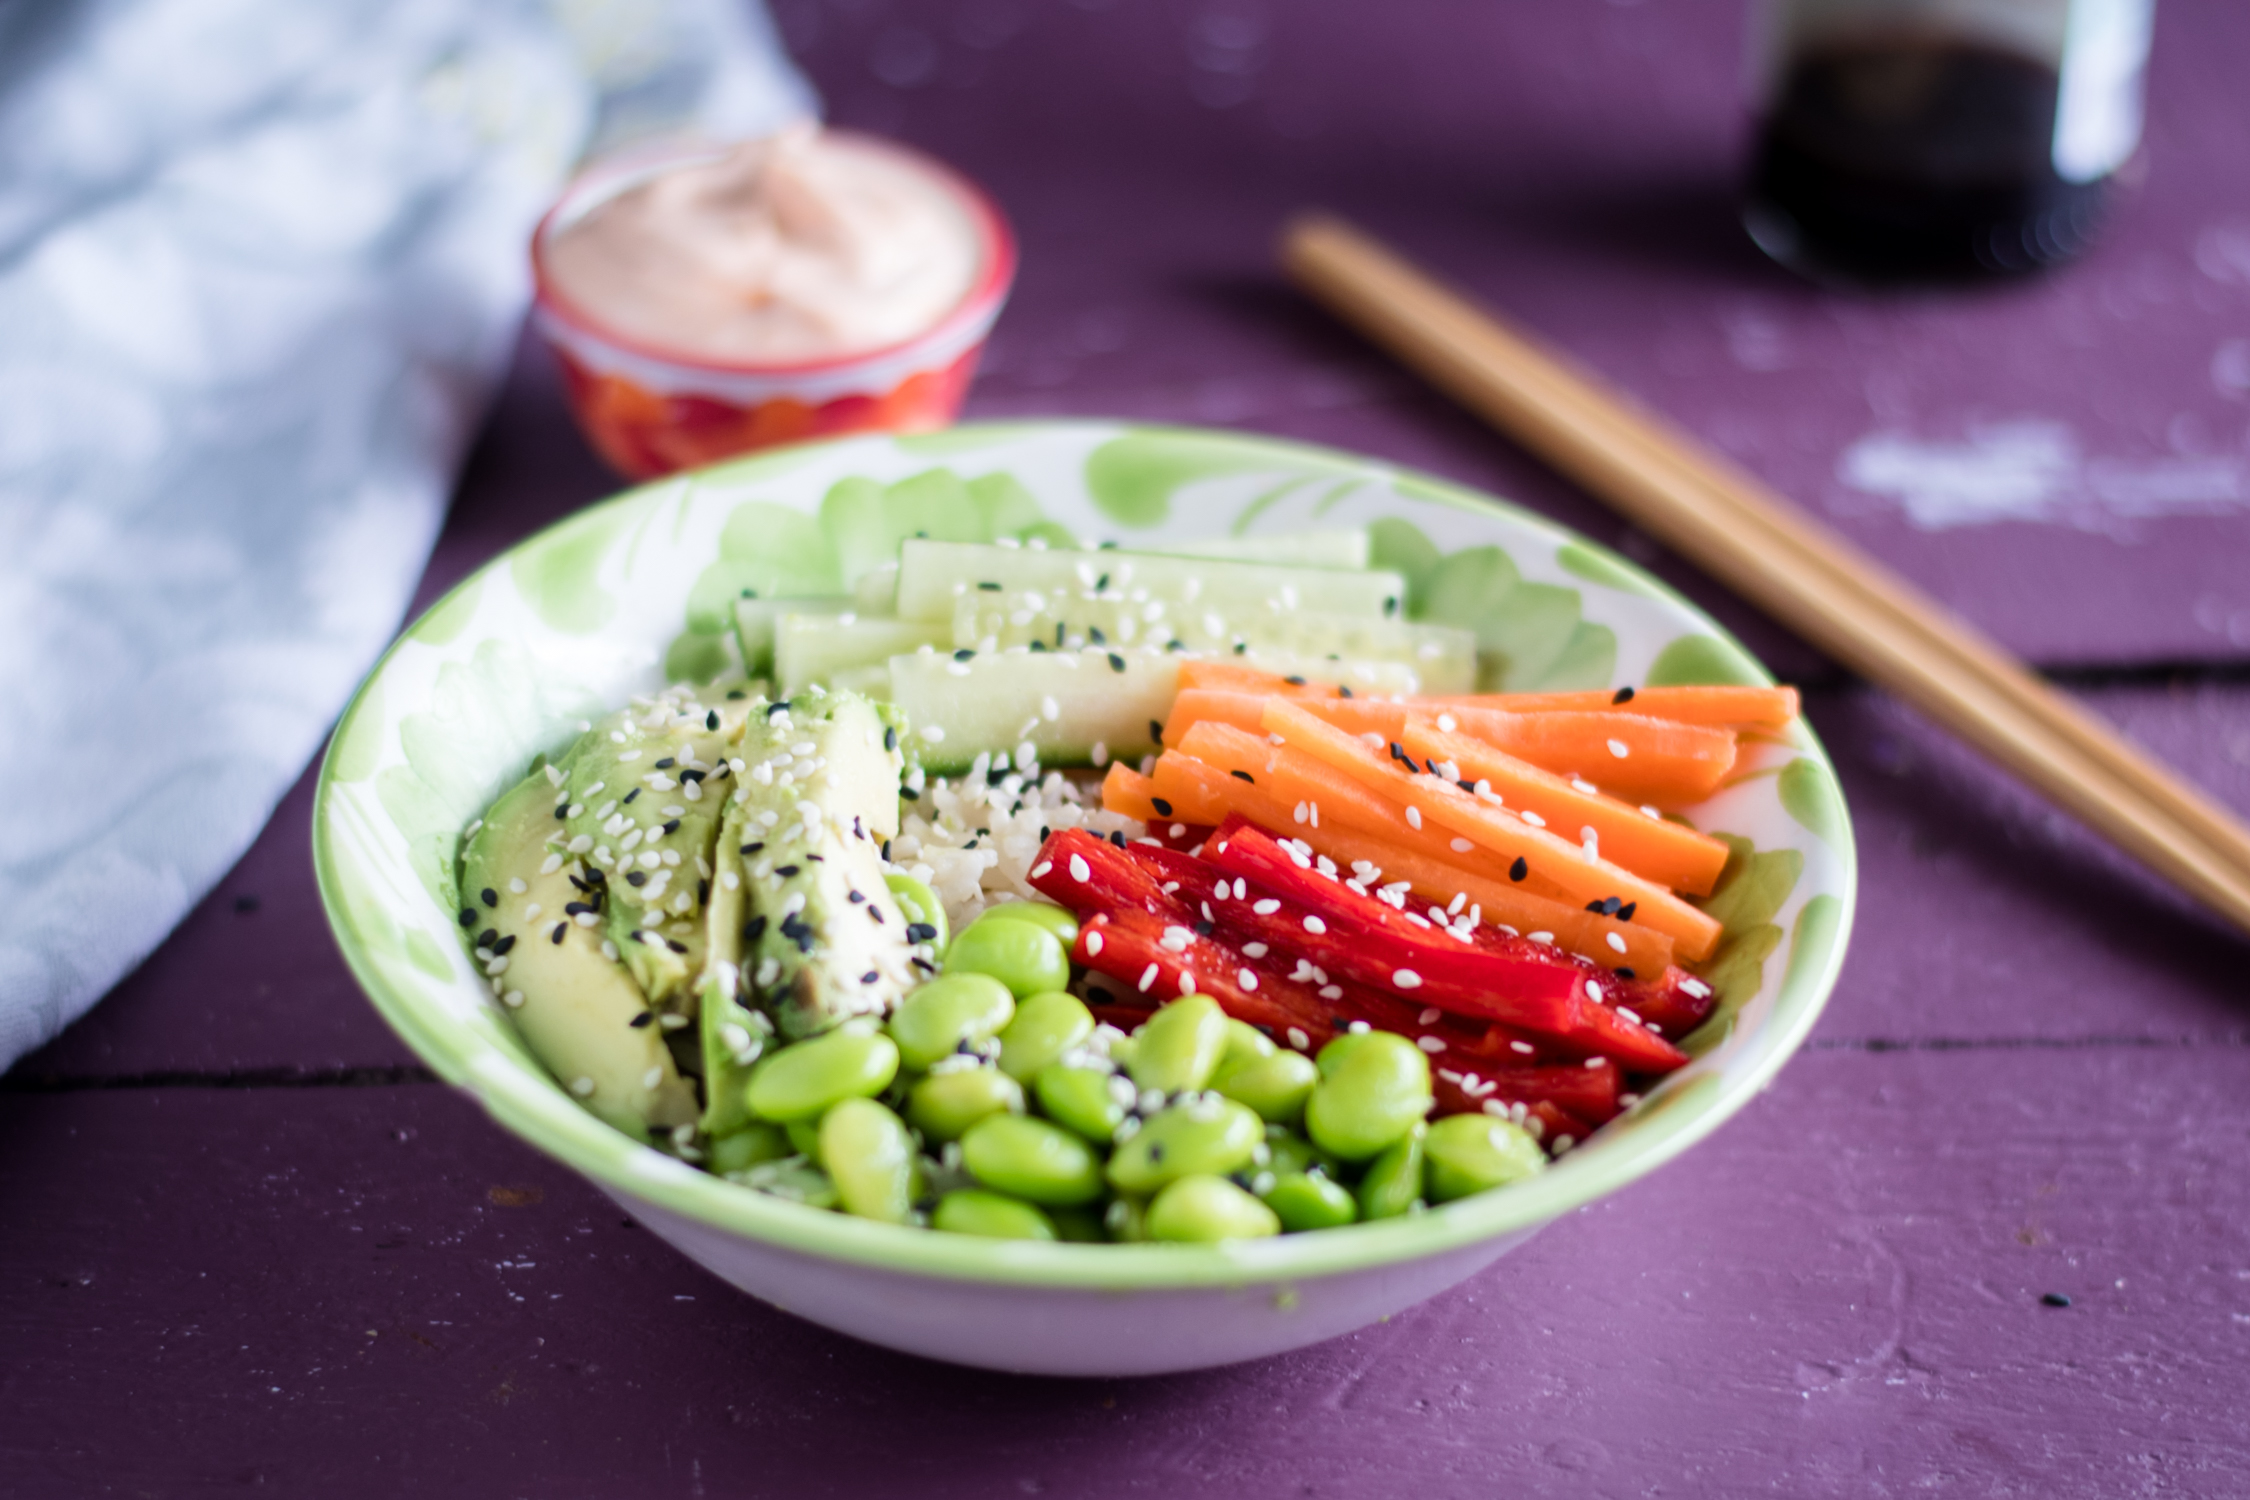 Vegan Sushi Bowls #vegan #recipes #glutenfree #rice